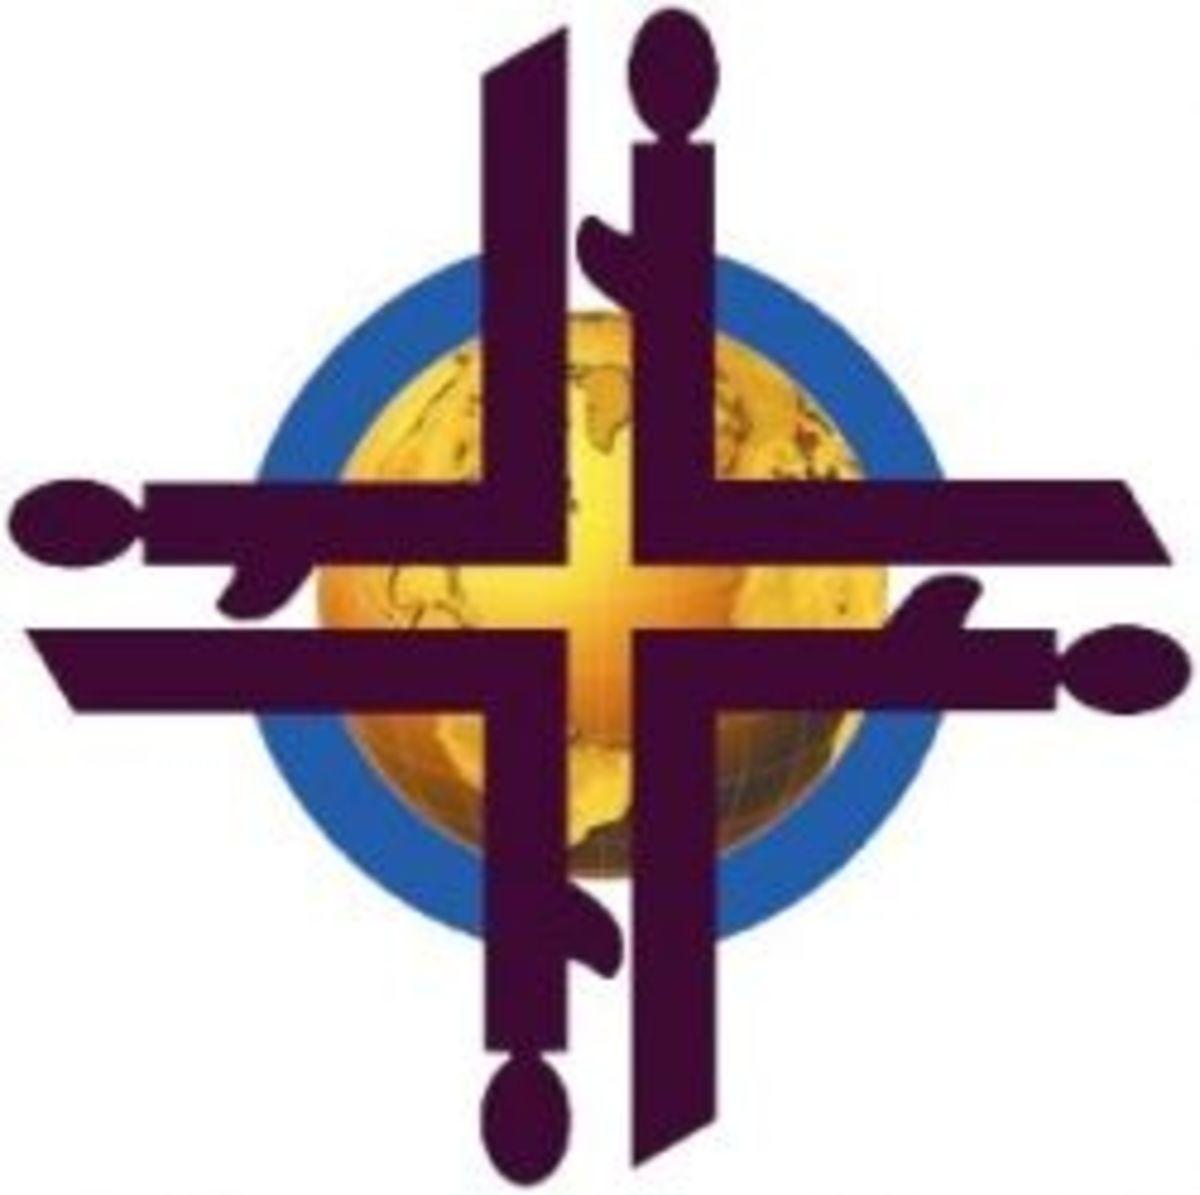 The World Day of Prayer logo